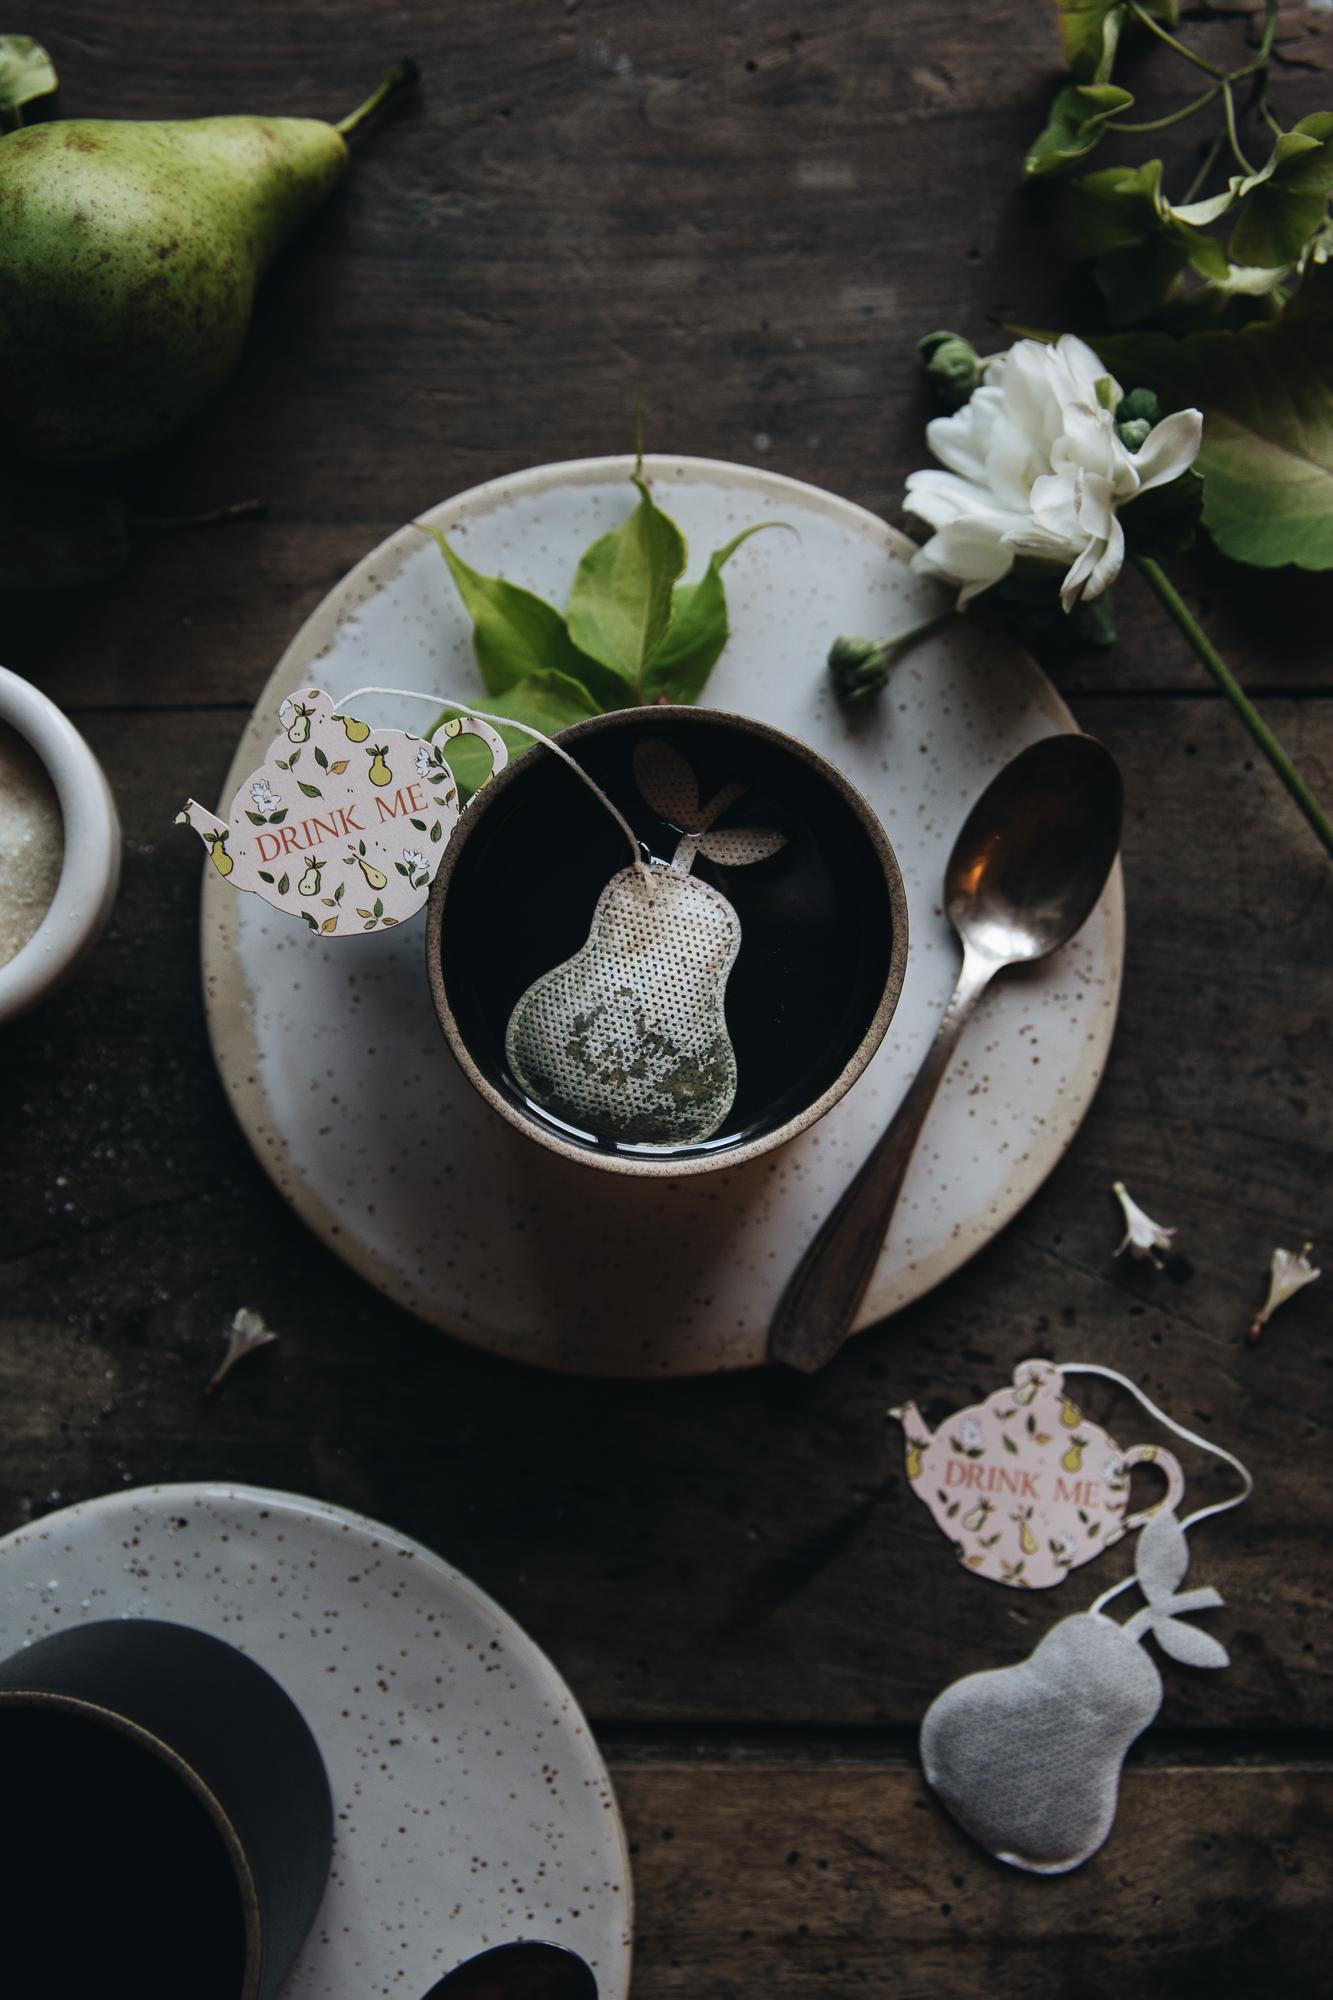 Songe de Poire Ophelie's Kitchen Book X Tea Heritage